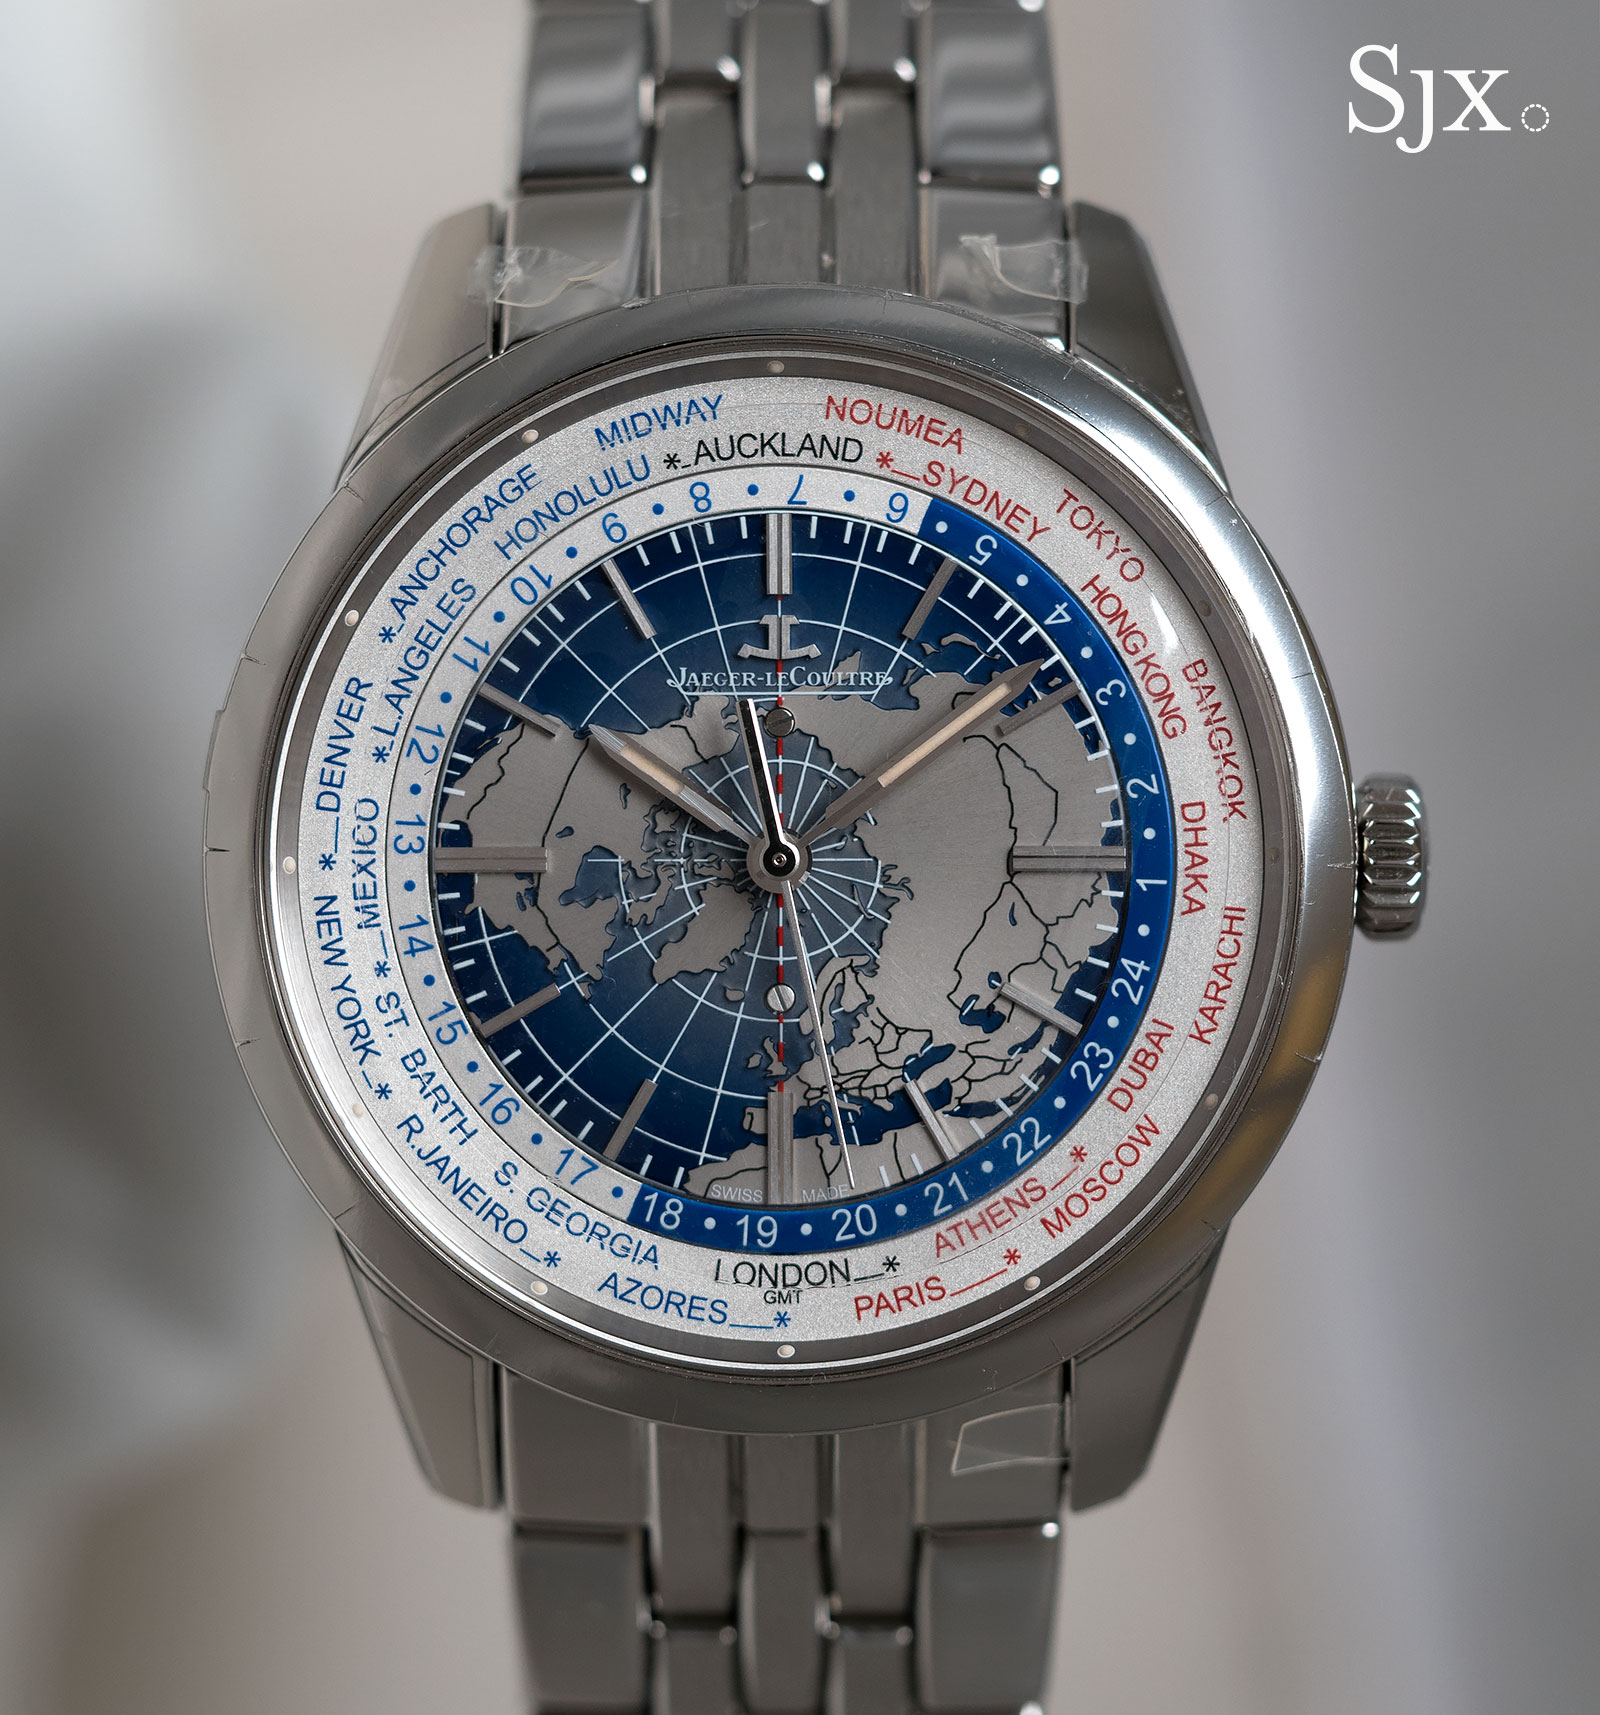 Jaeger-LeCoultre Geophysic Universal Time bracelet